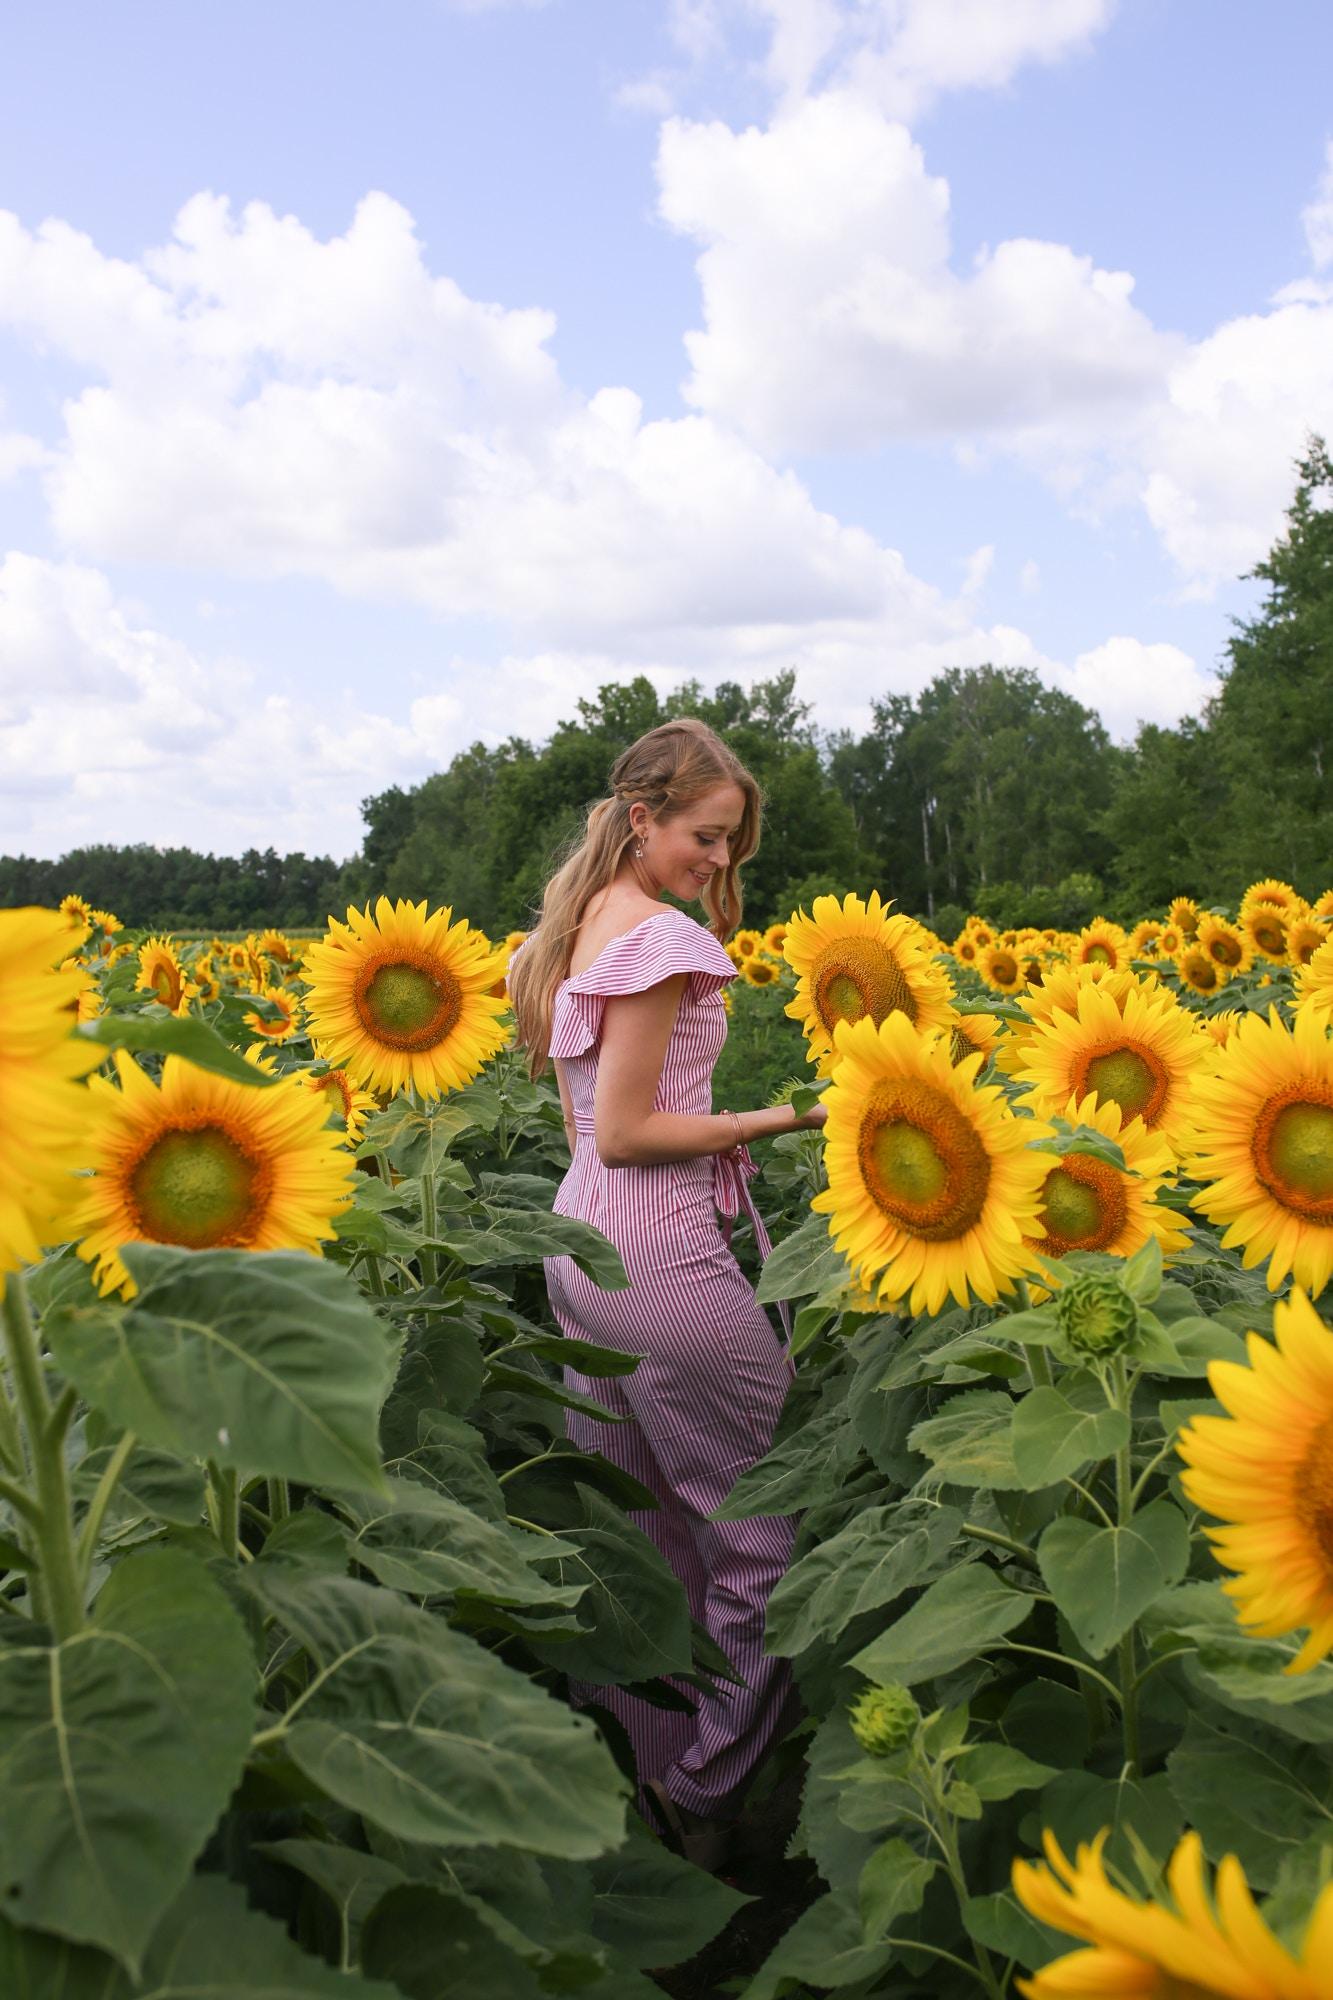 sunflower fields near toronto still open